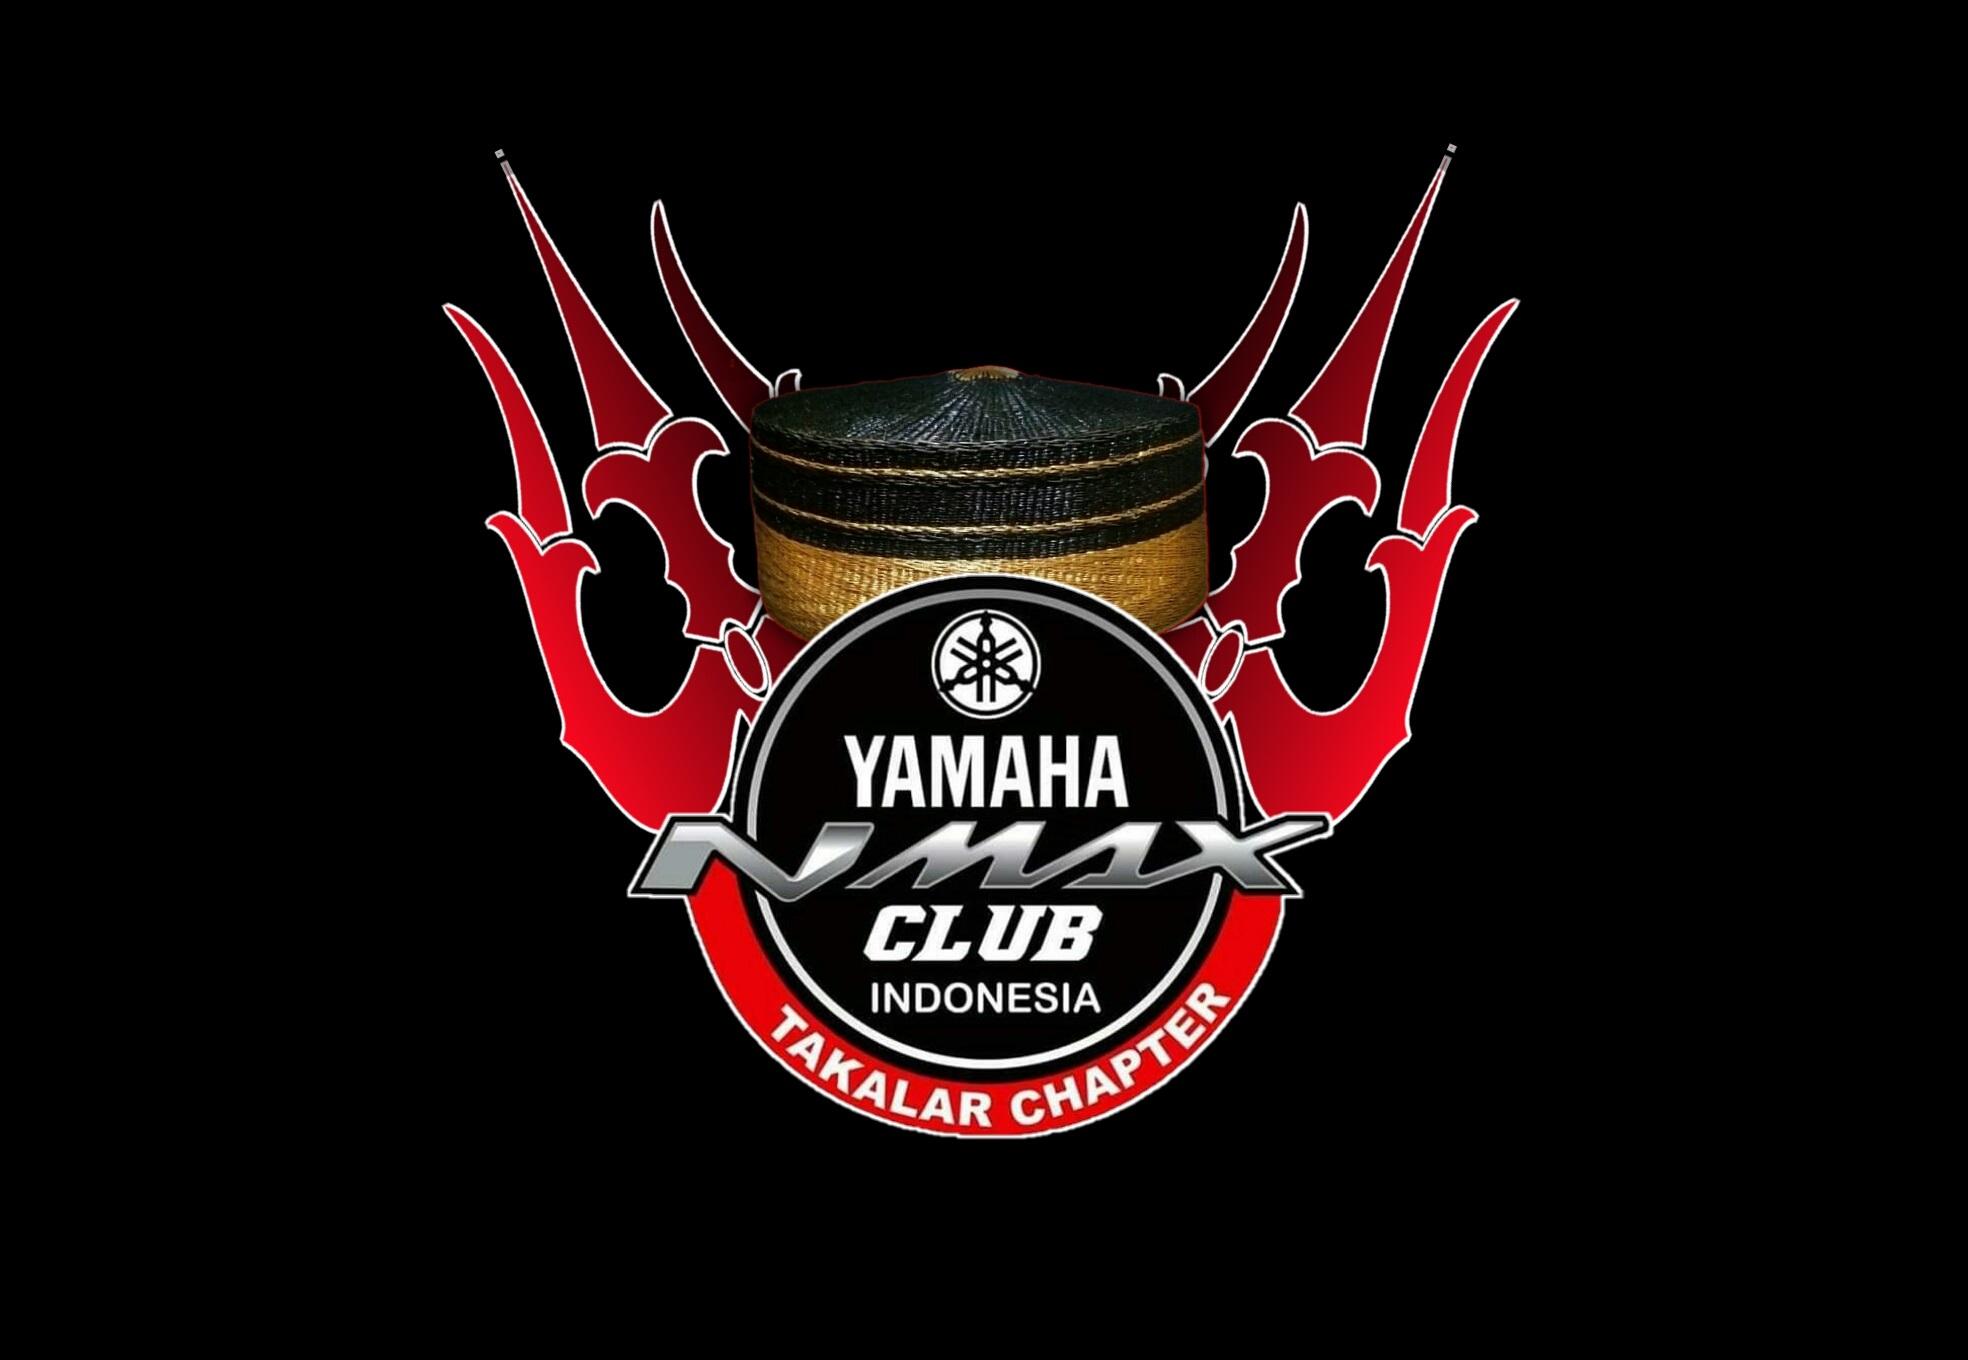 Yamaha NMax Club Indonesia (YNCI) Takalar Ganti Logo, Adopsi  Jiwa Pejuang Para Raja